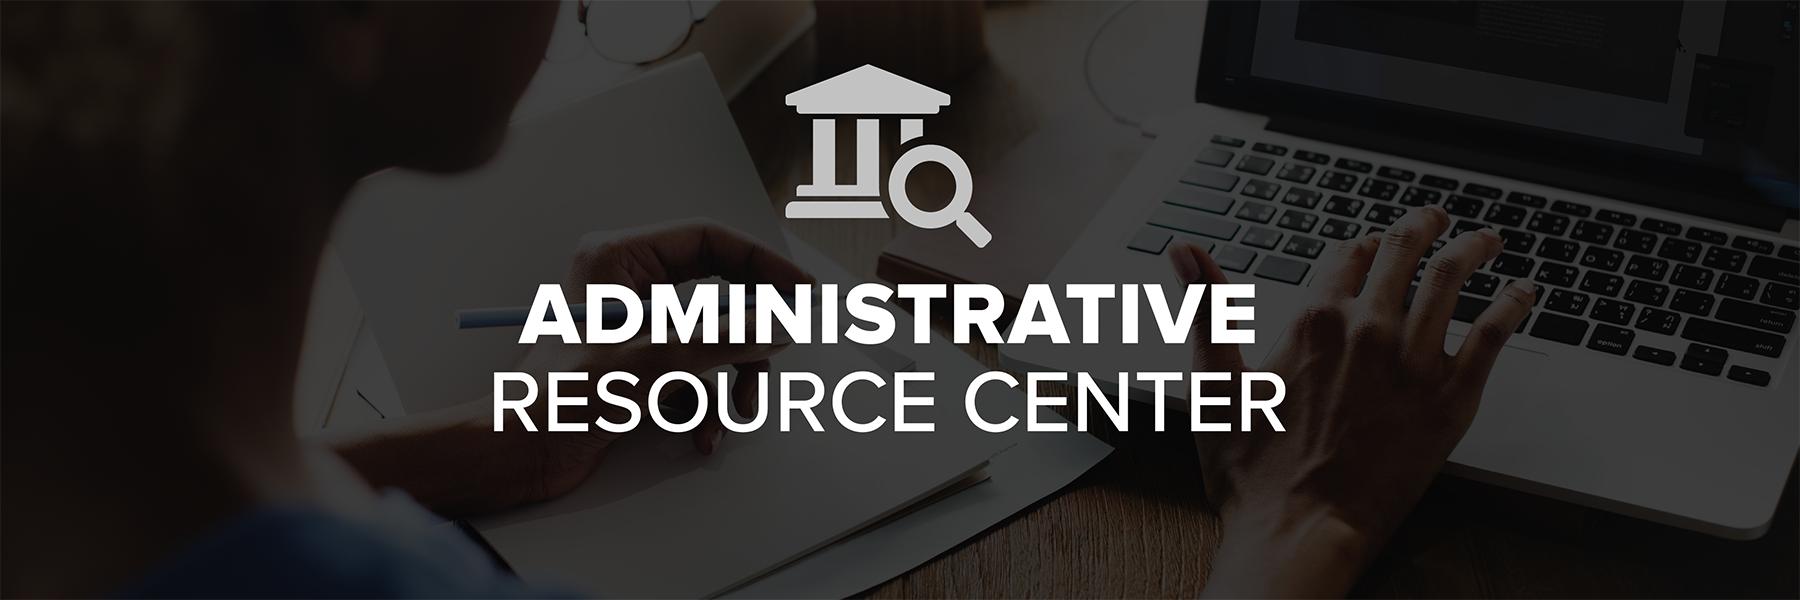 Administrative Resource Center